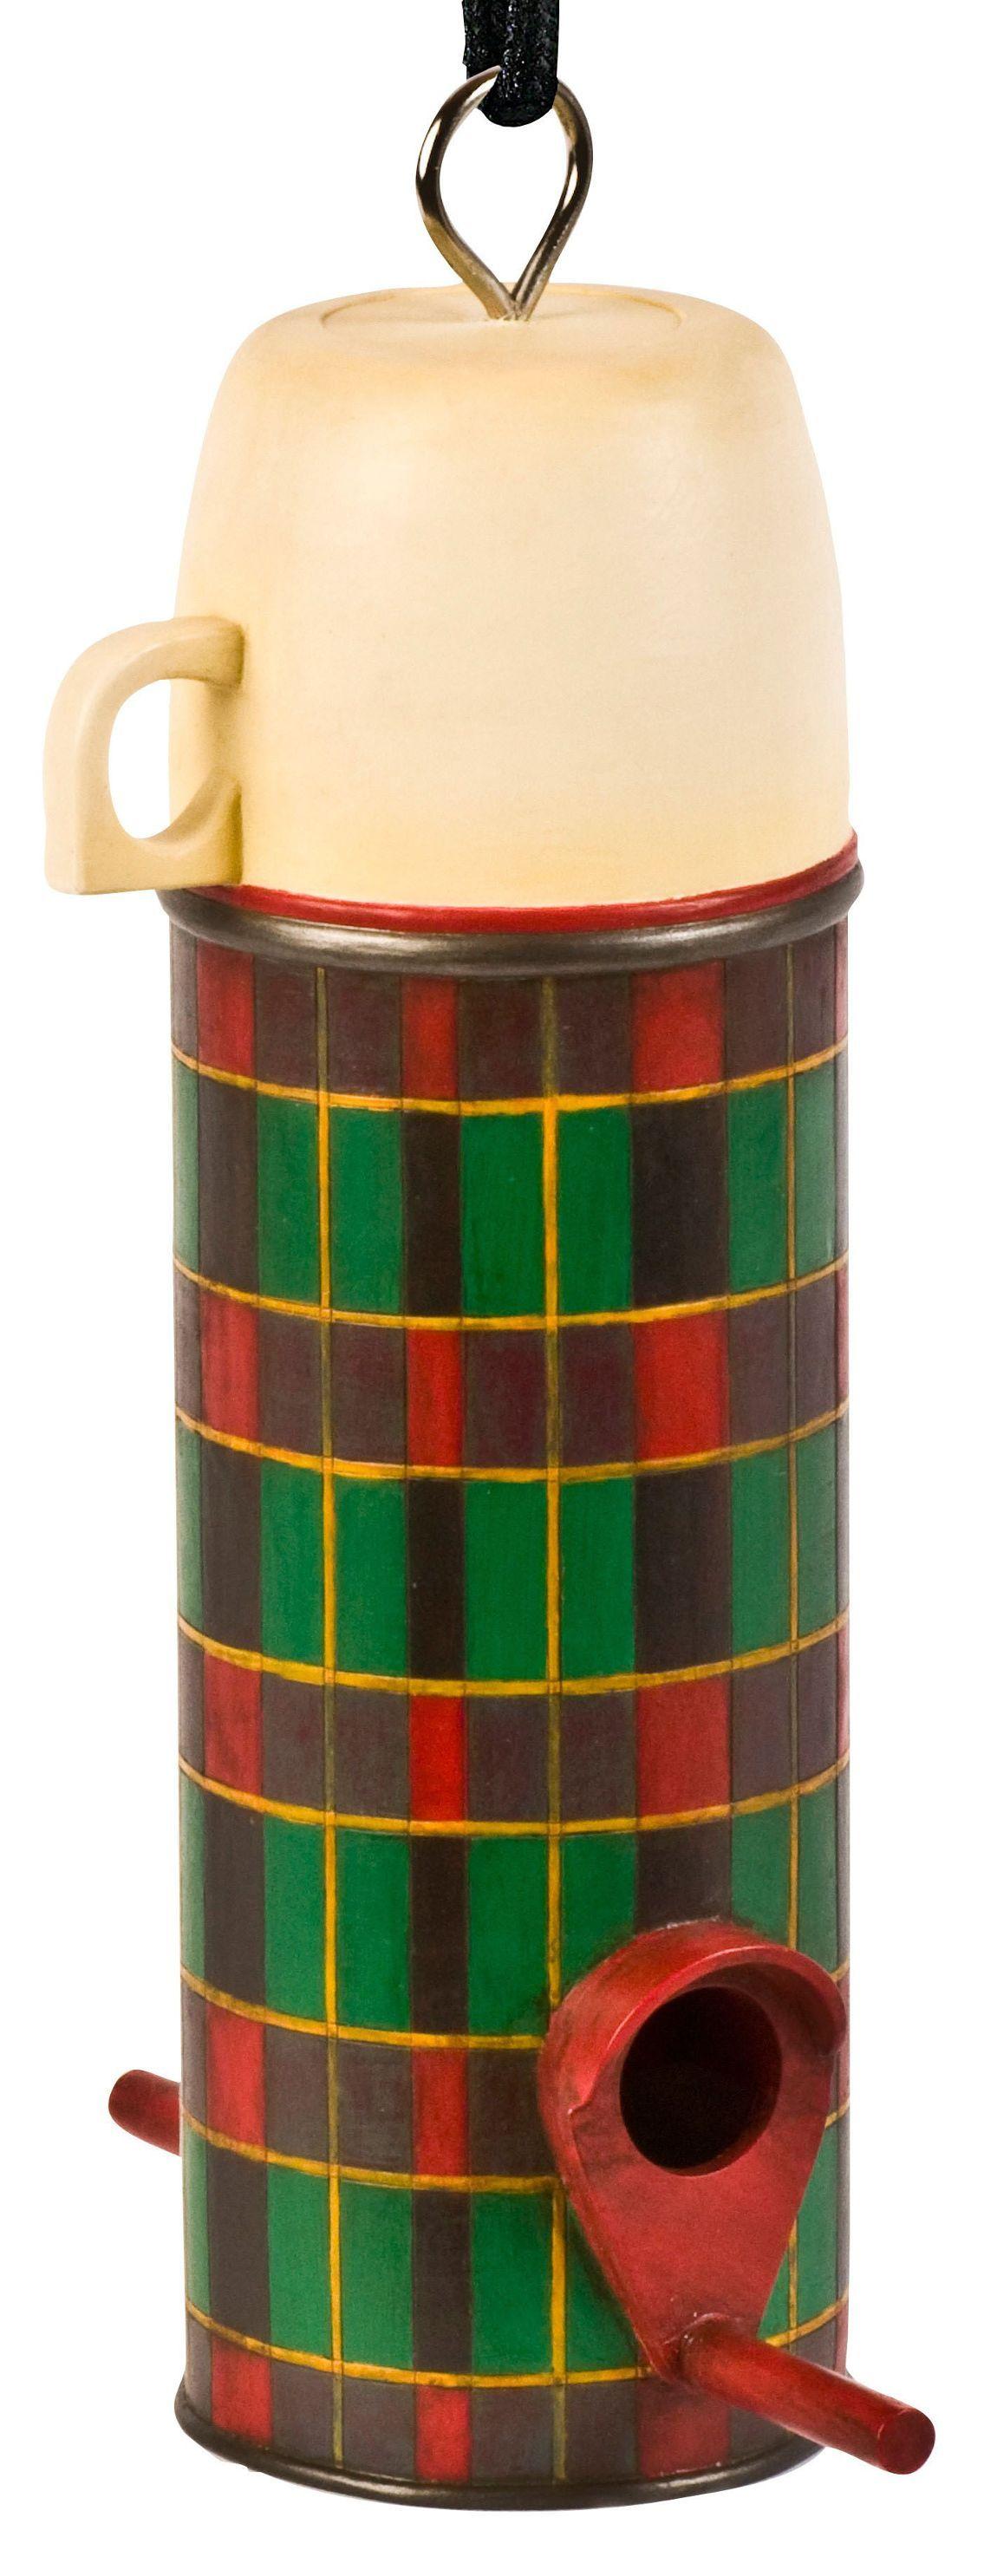 Vintage Thermos Feeder